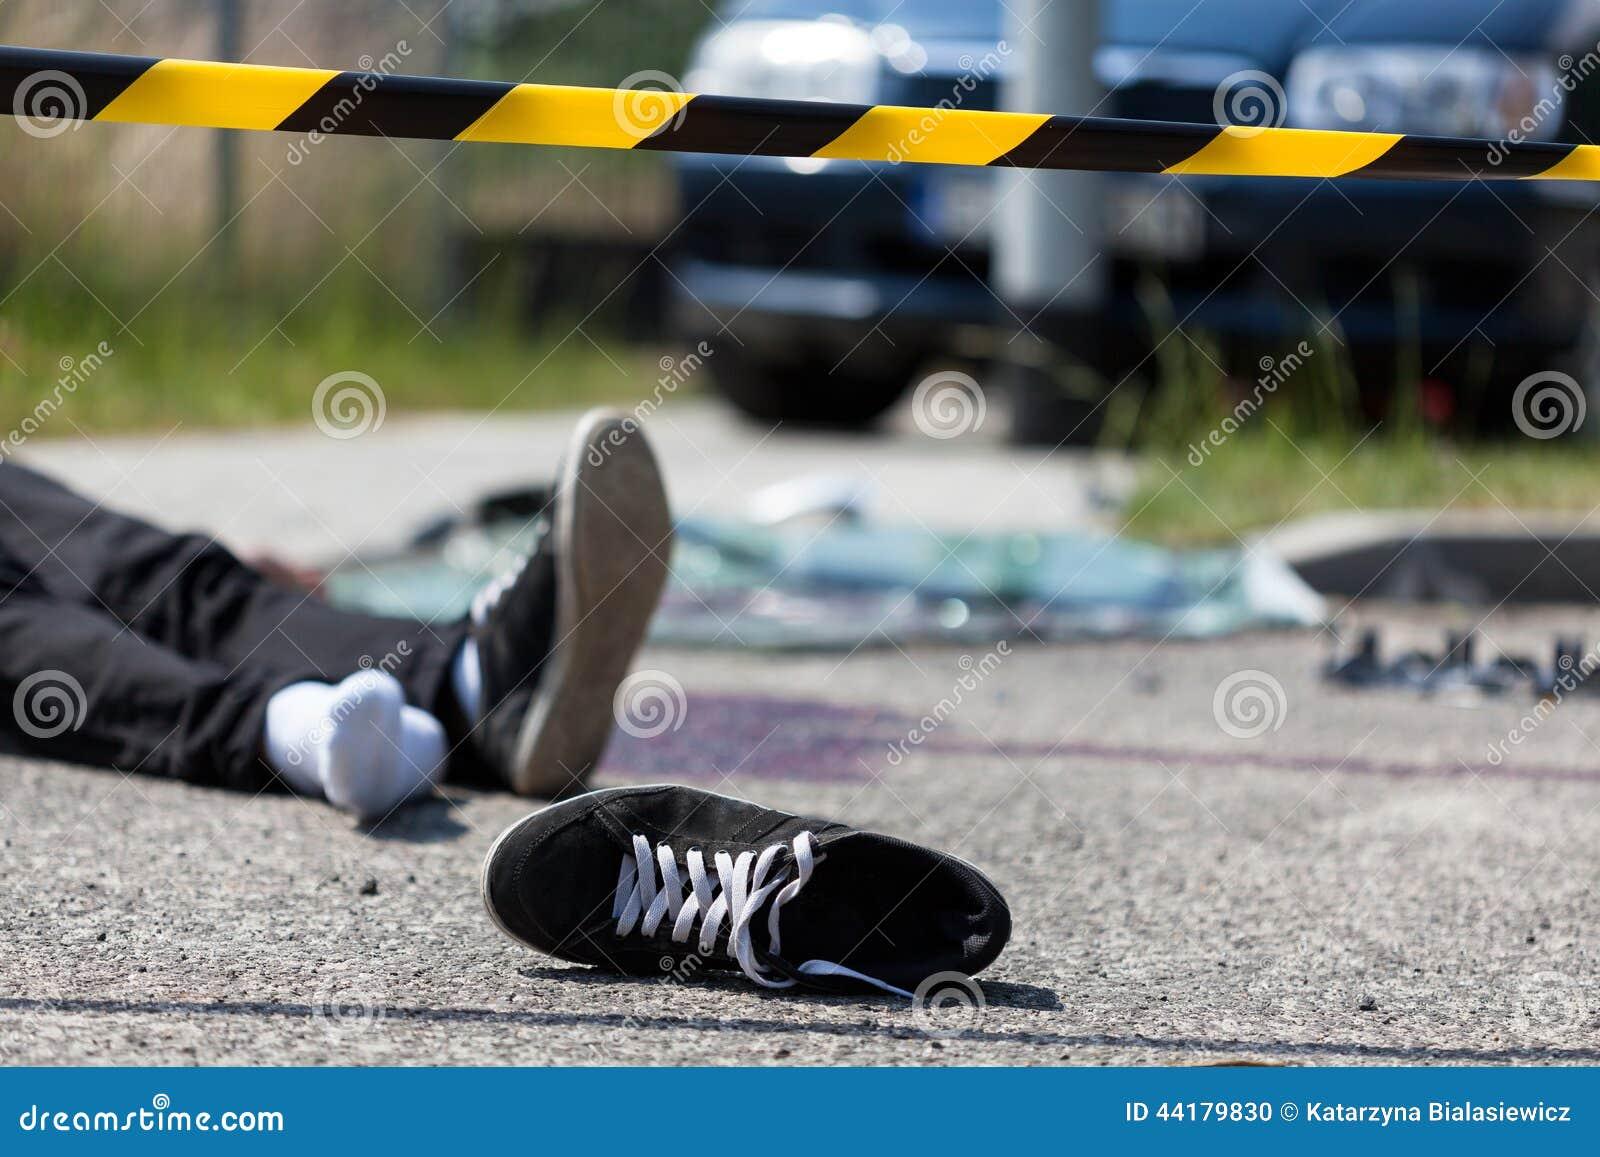 Сцена автокатастрофы